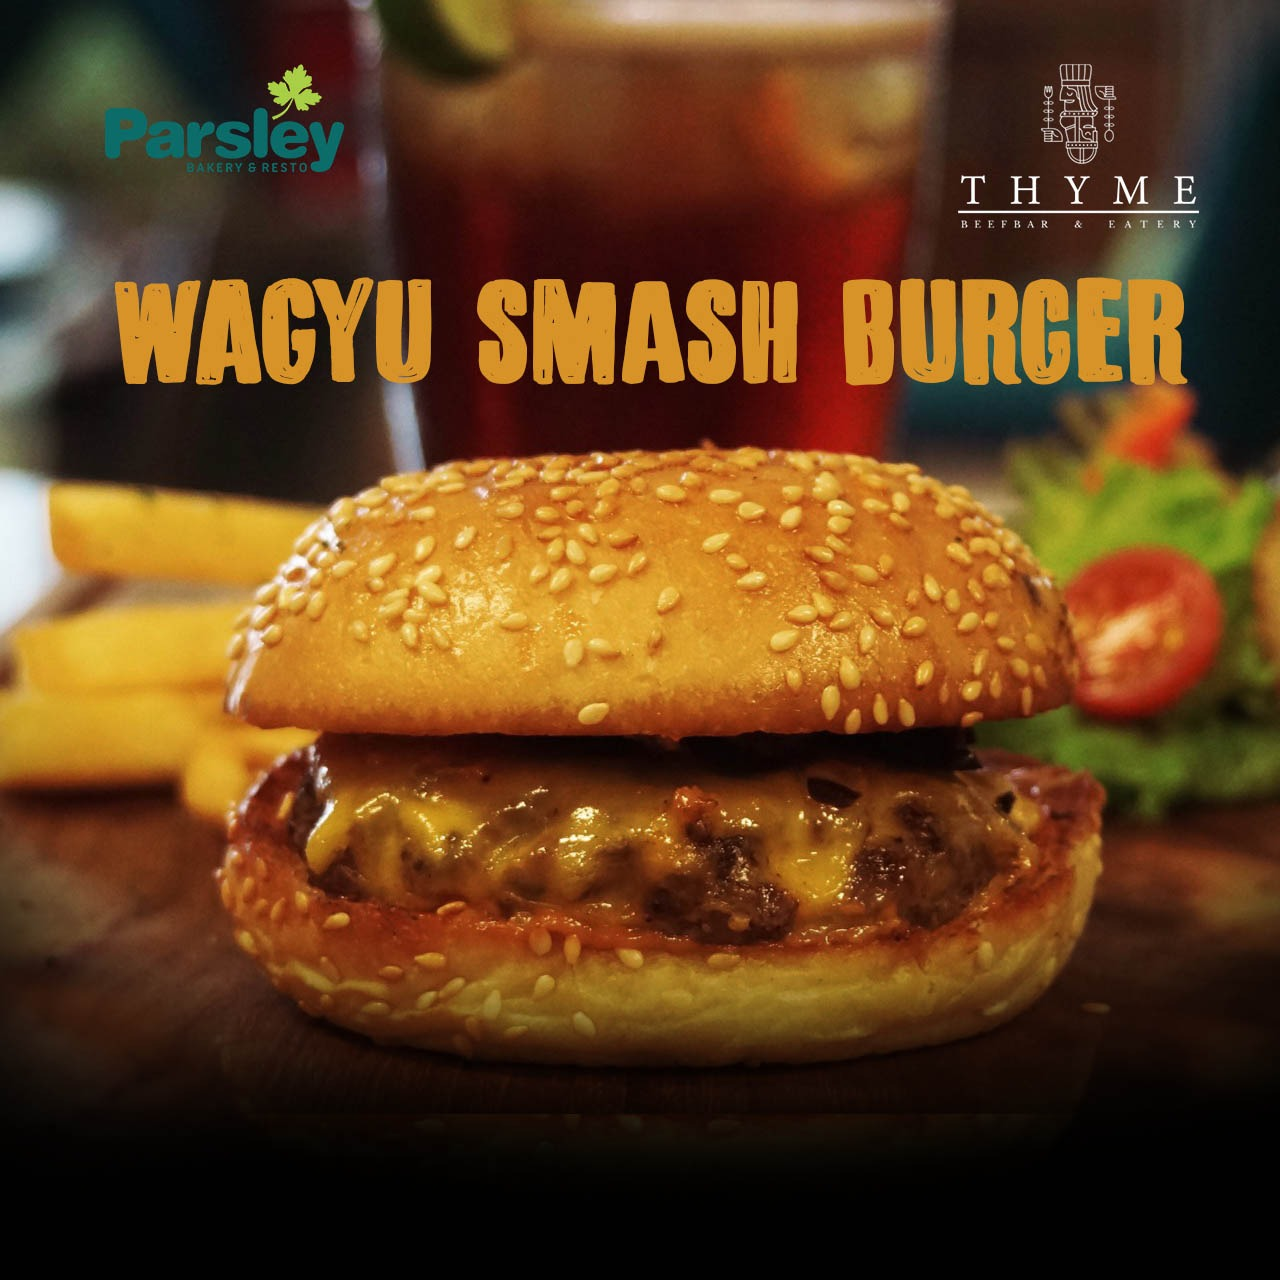 WAGYU SMASH BURGER